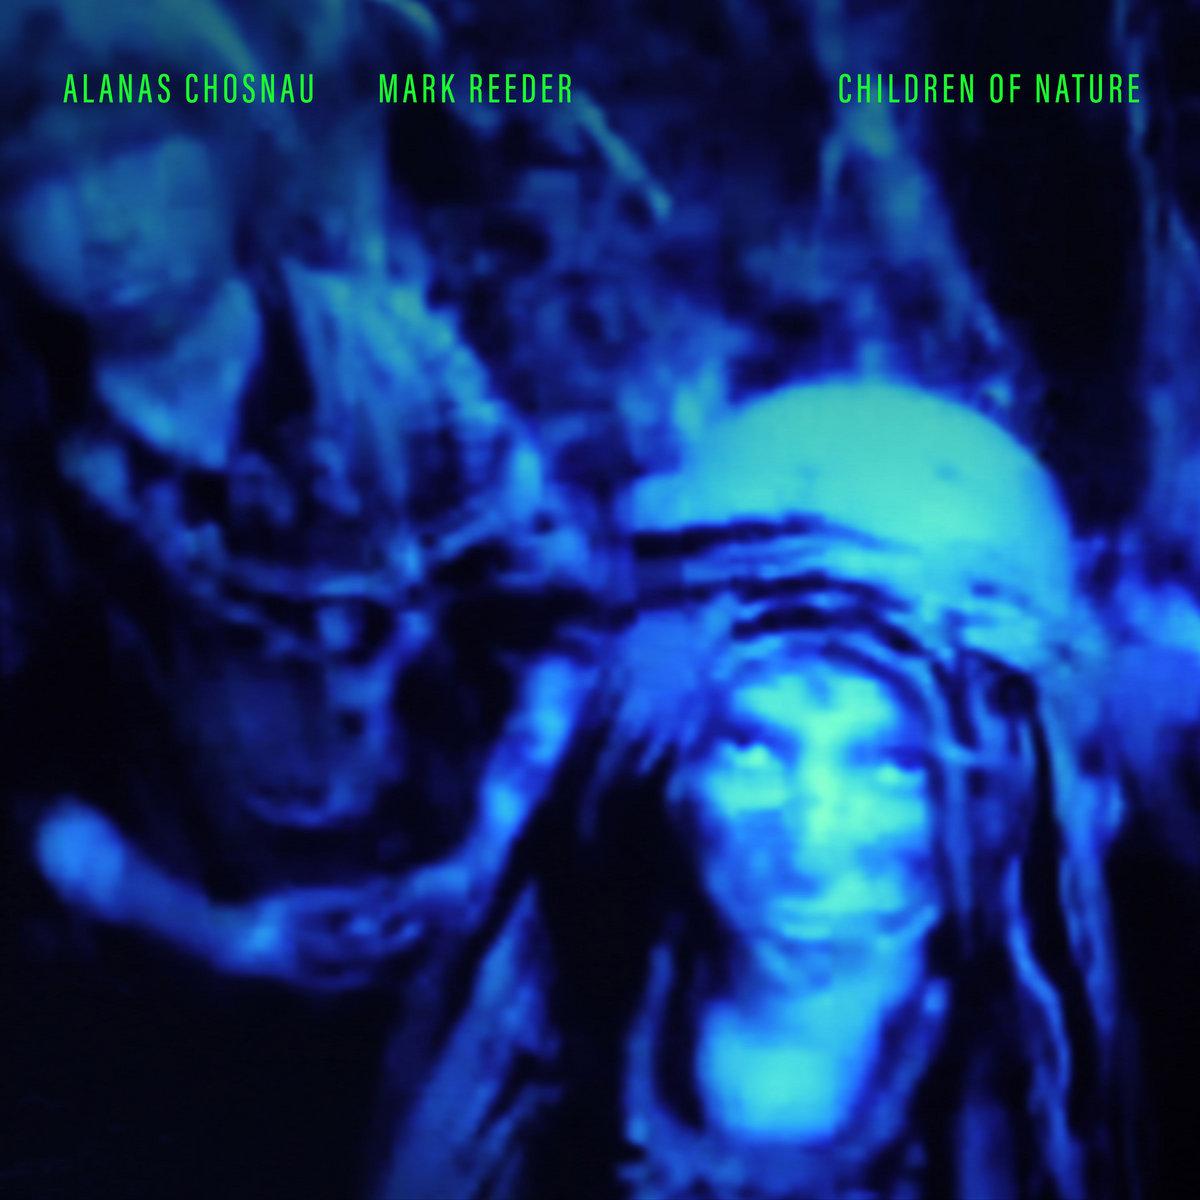 Single of the week – Alanas Chosnau & Mark Reeder – Children of Nature